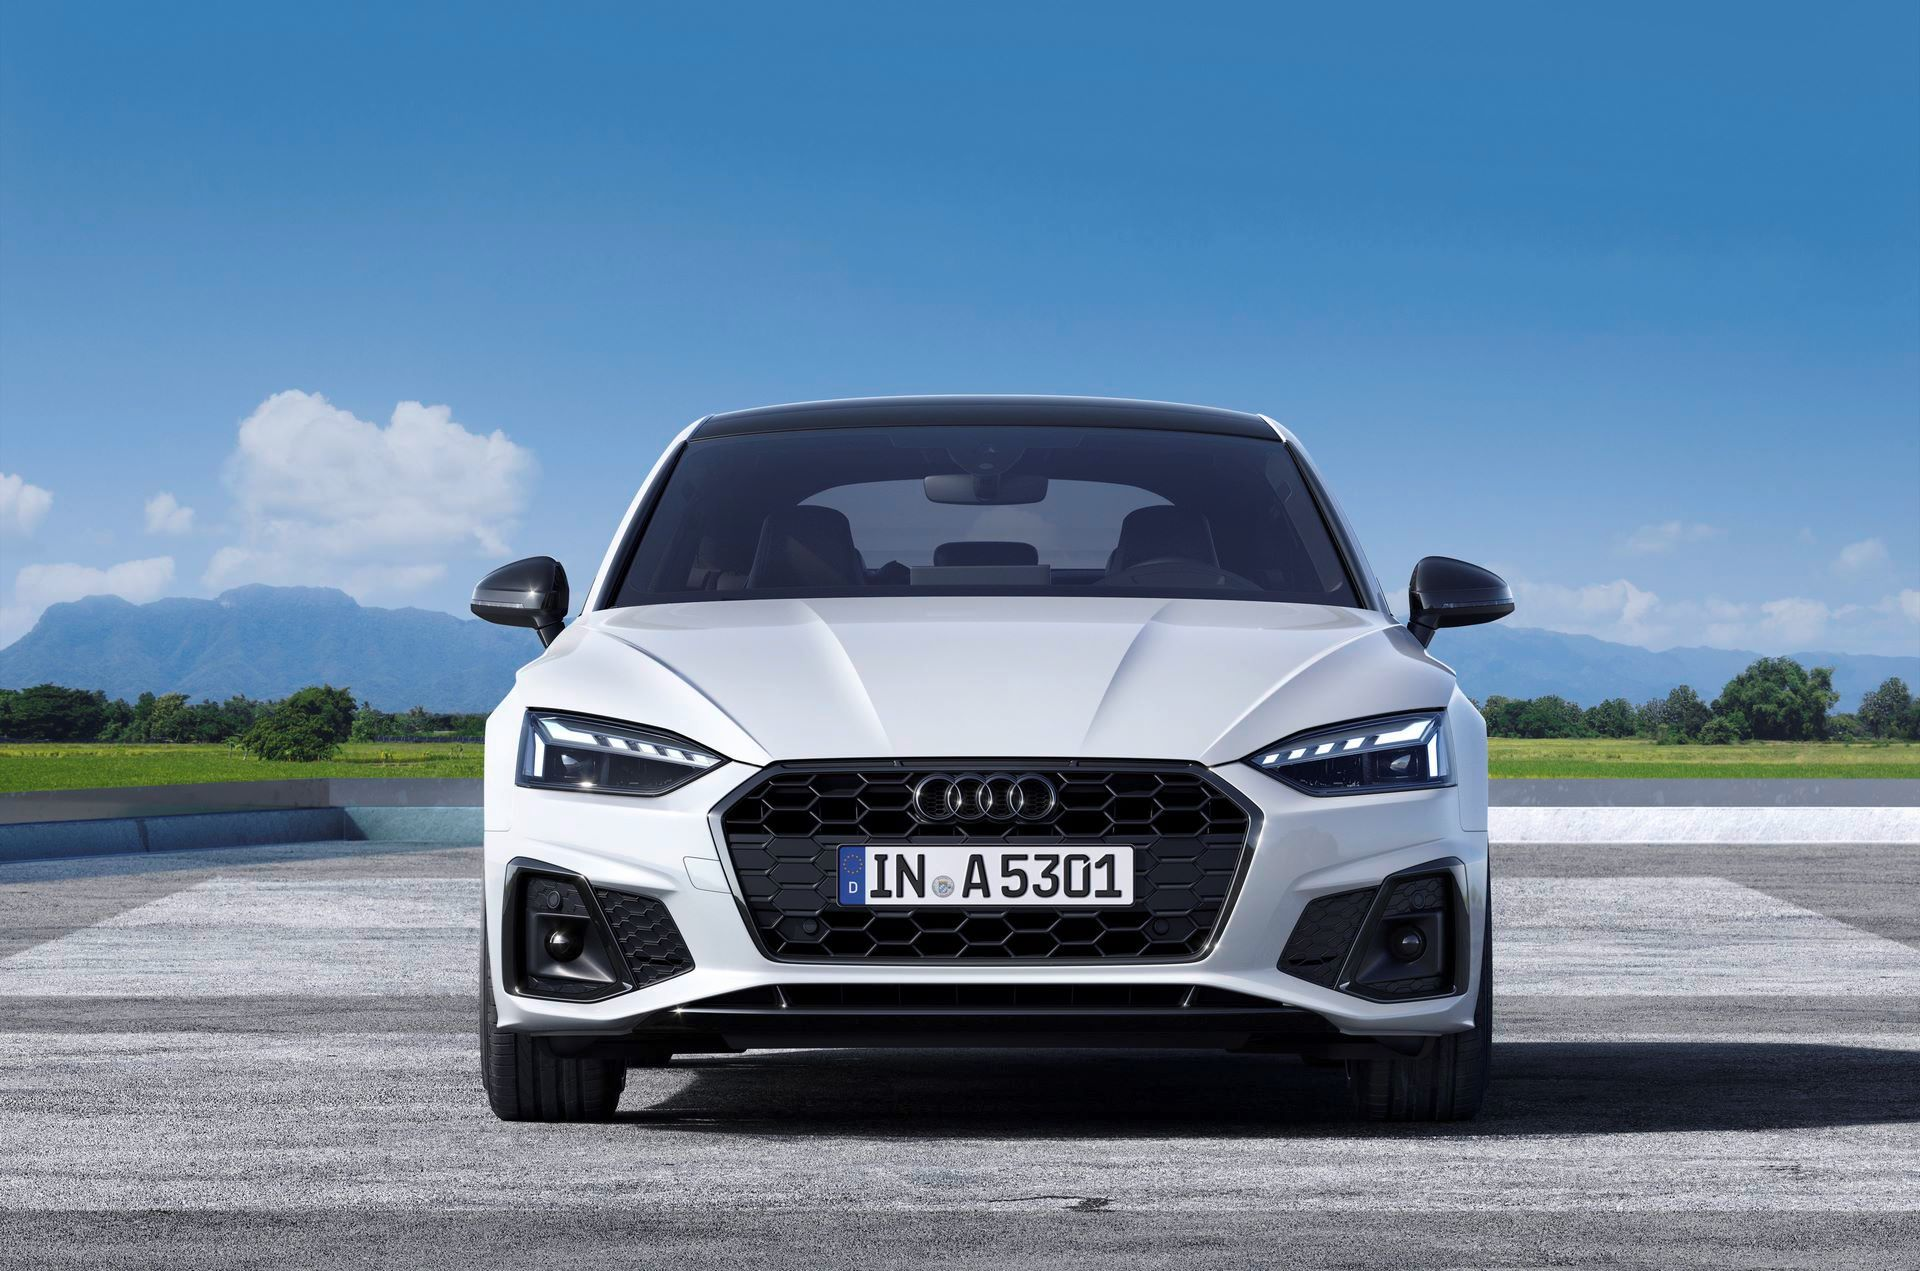 Audi-A4-A5-Q7-Q8-Competition-And-Competition-Plus-Trims-60